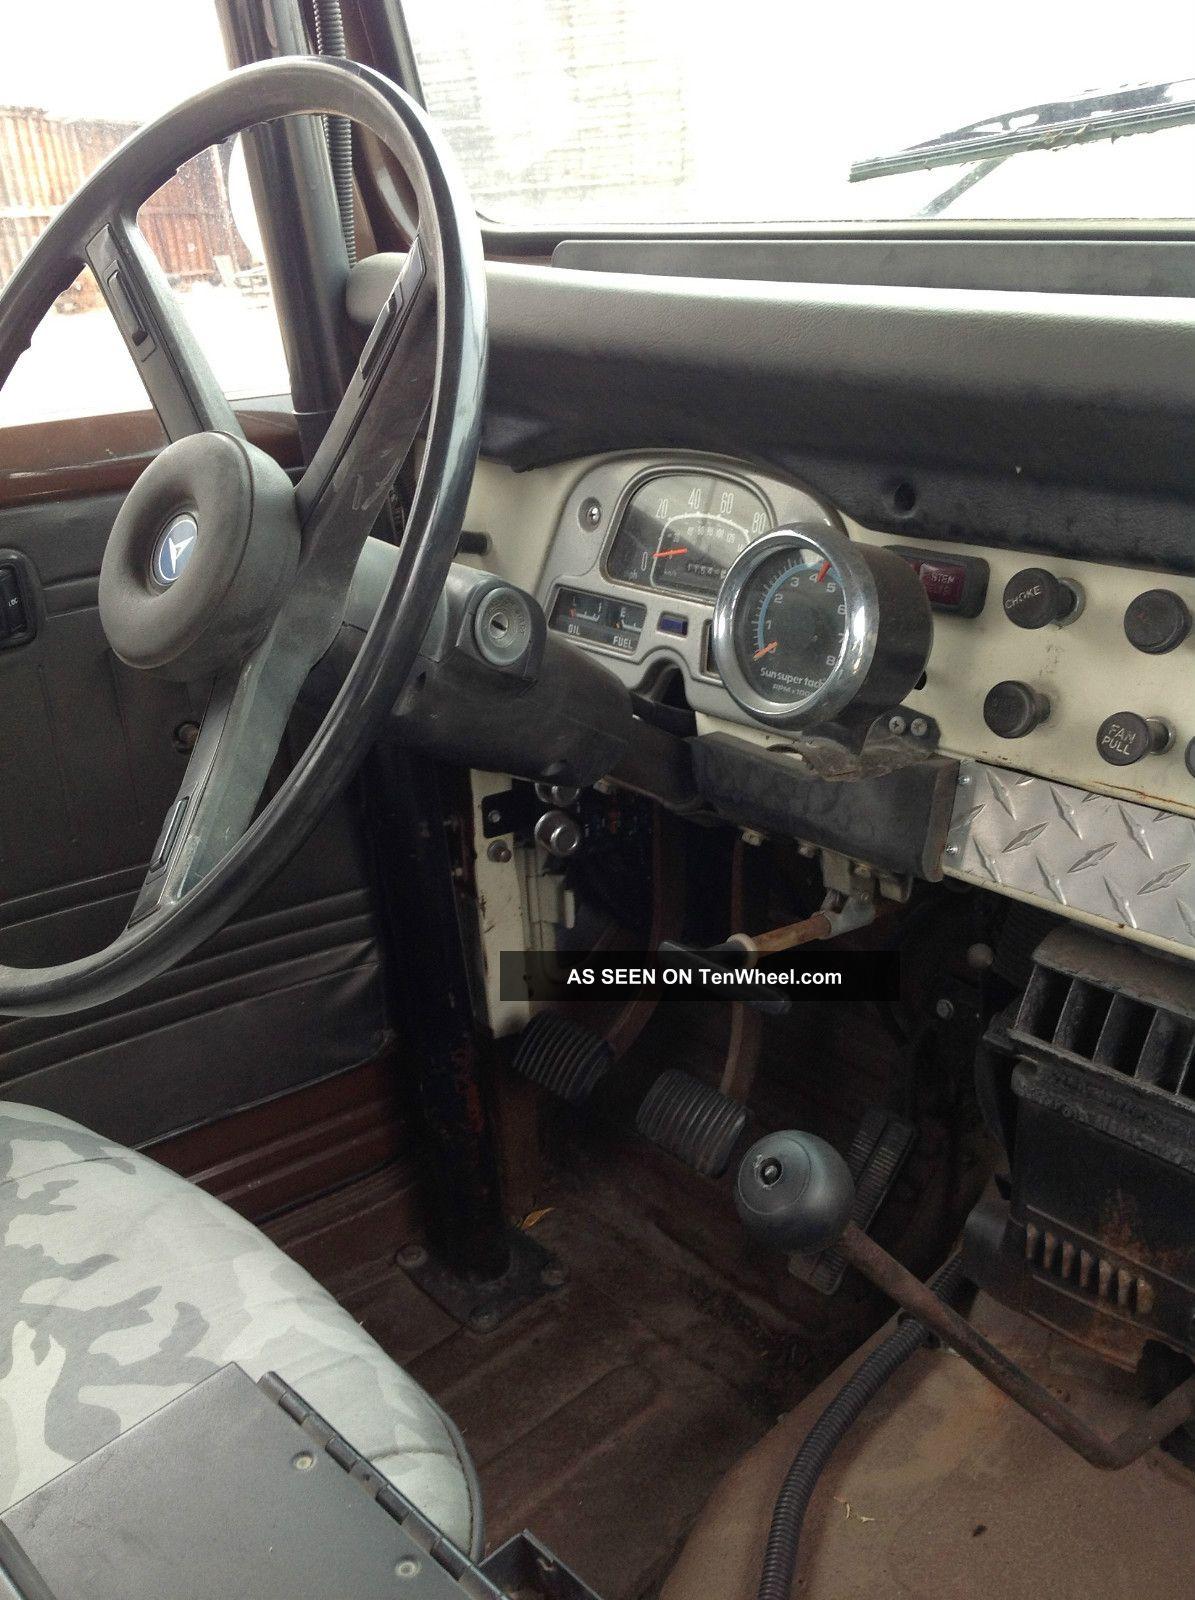 1978 Toyota Land Cruiser Fj40 W / Chevy 350 V - 8 Conversion